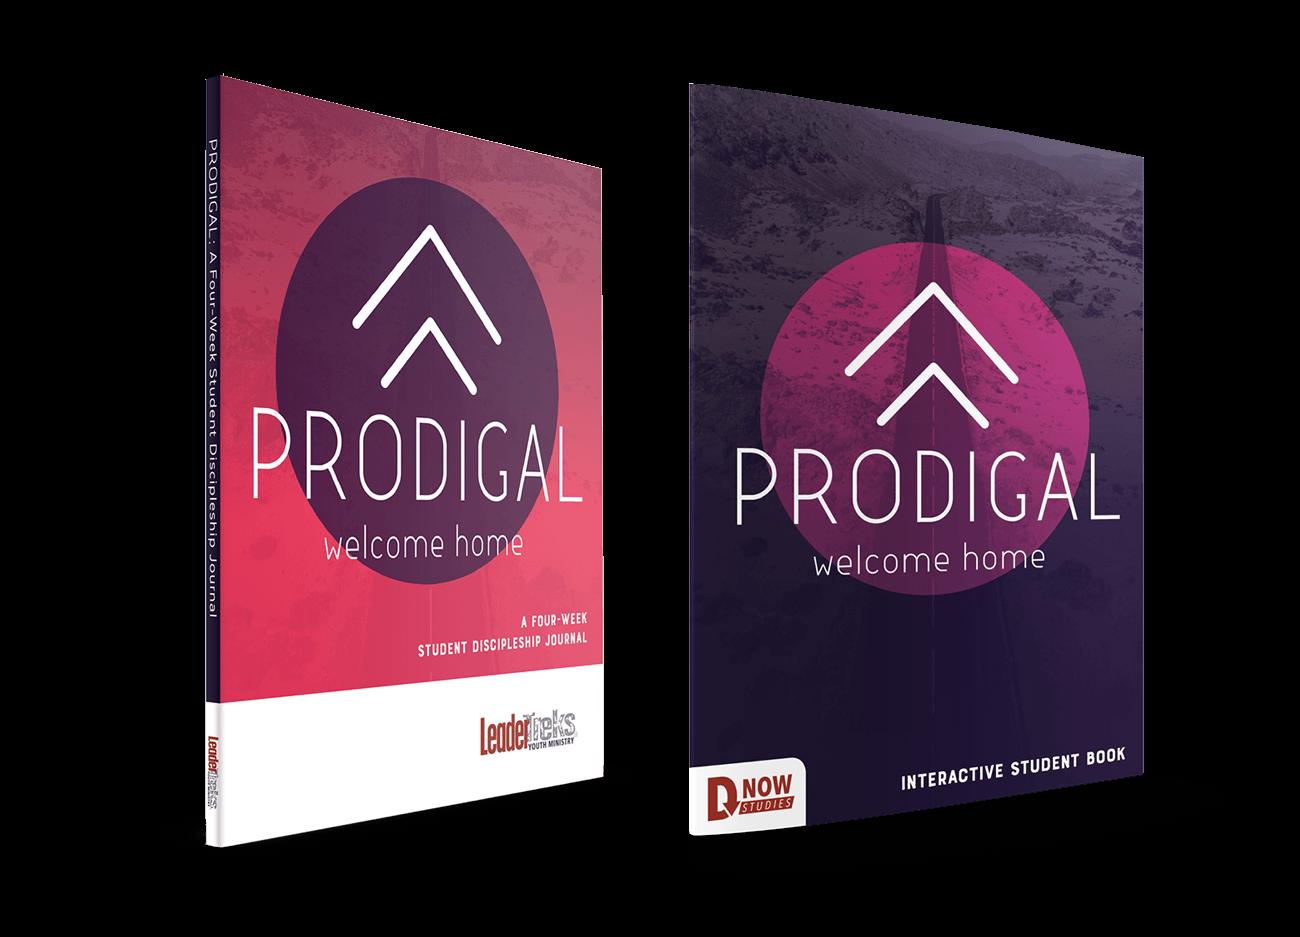 prodigal dnow studies book bundle